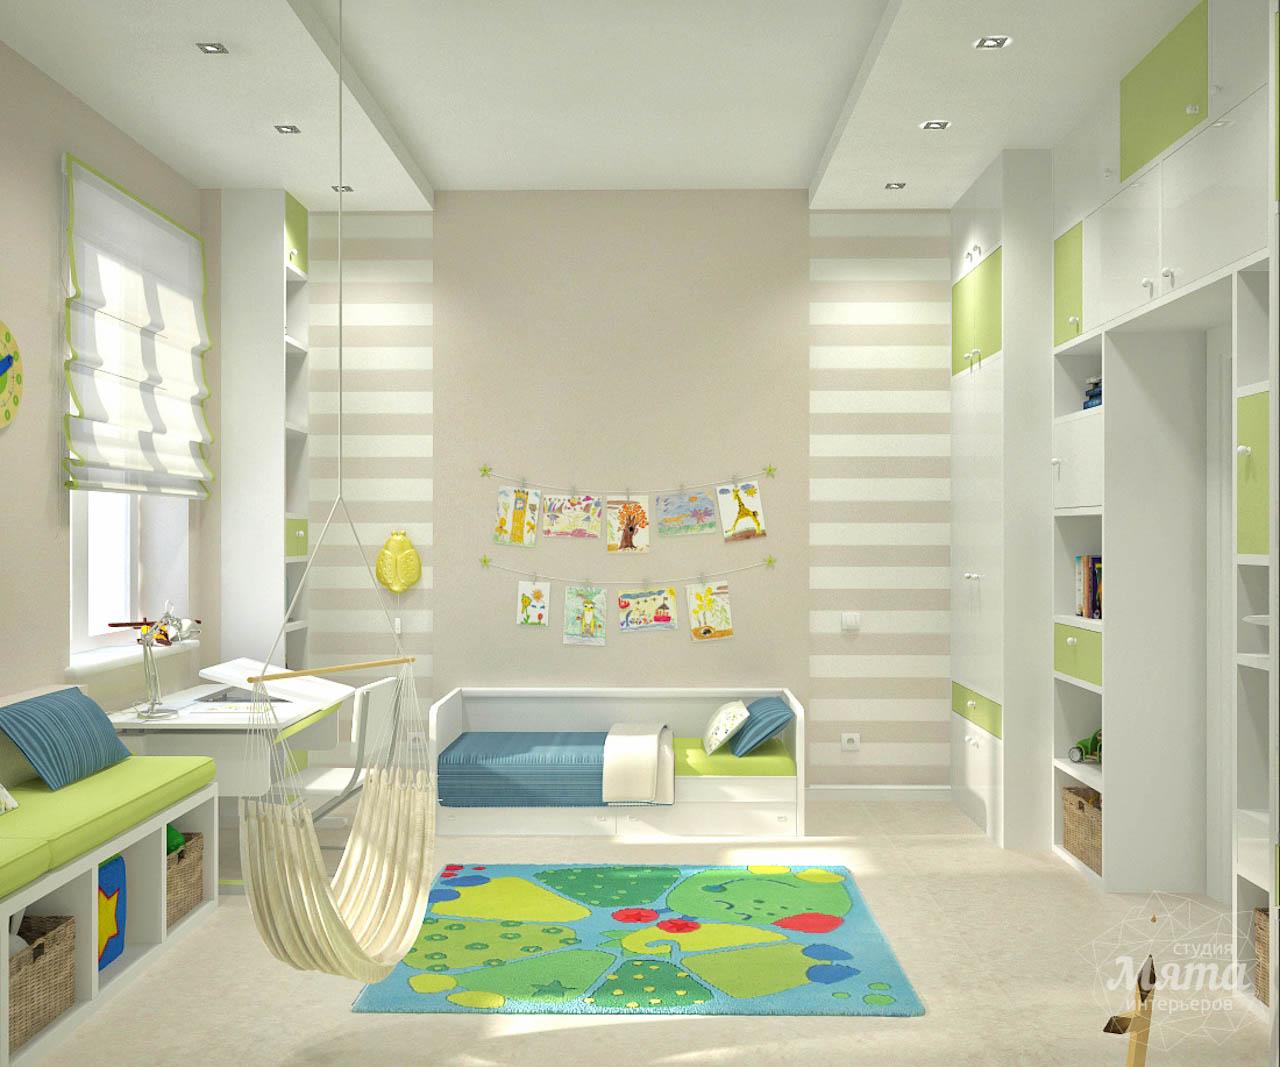 Дизайн интерьера и ремонт трехкомнатной квартиры по ул. Чкалова 124 img14954443